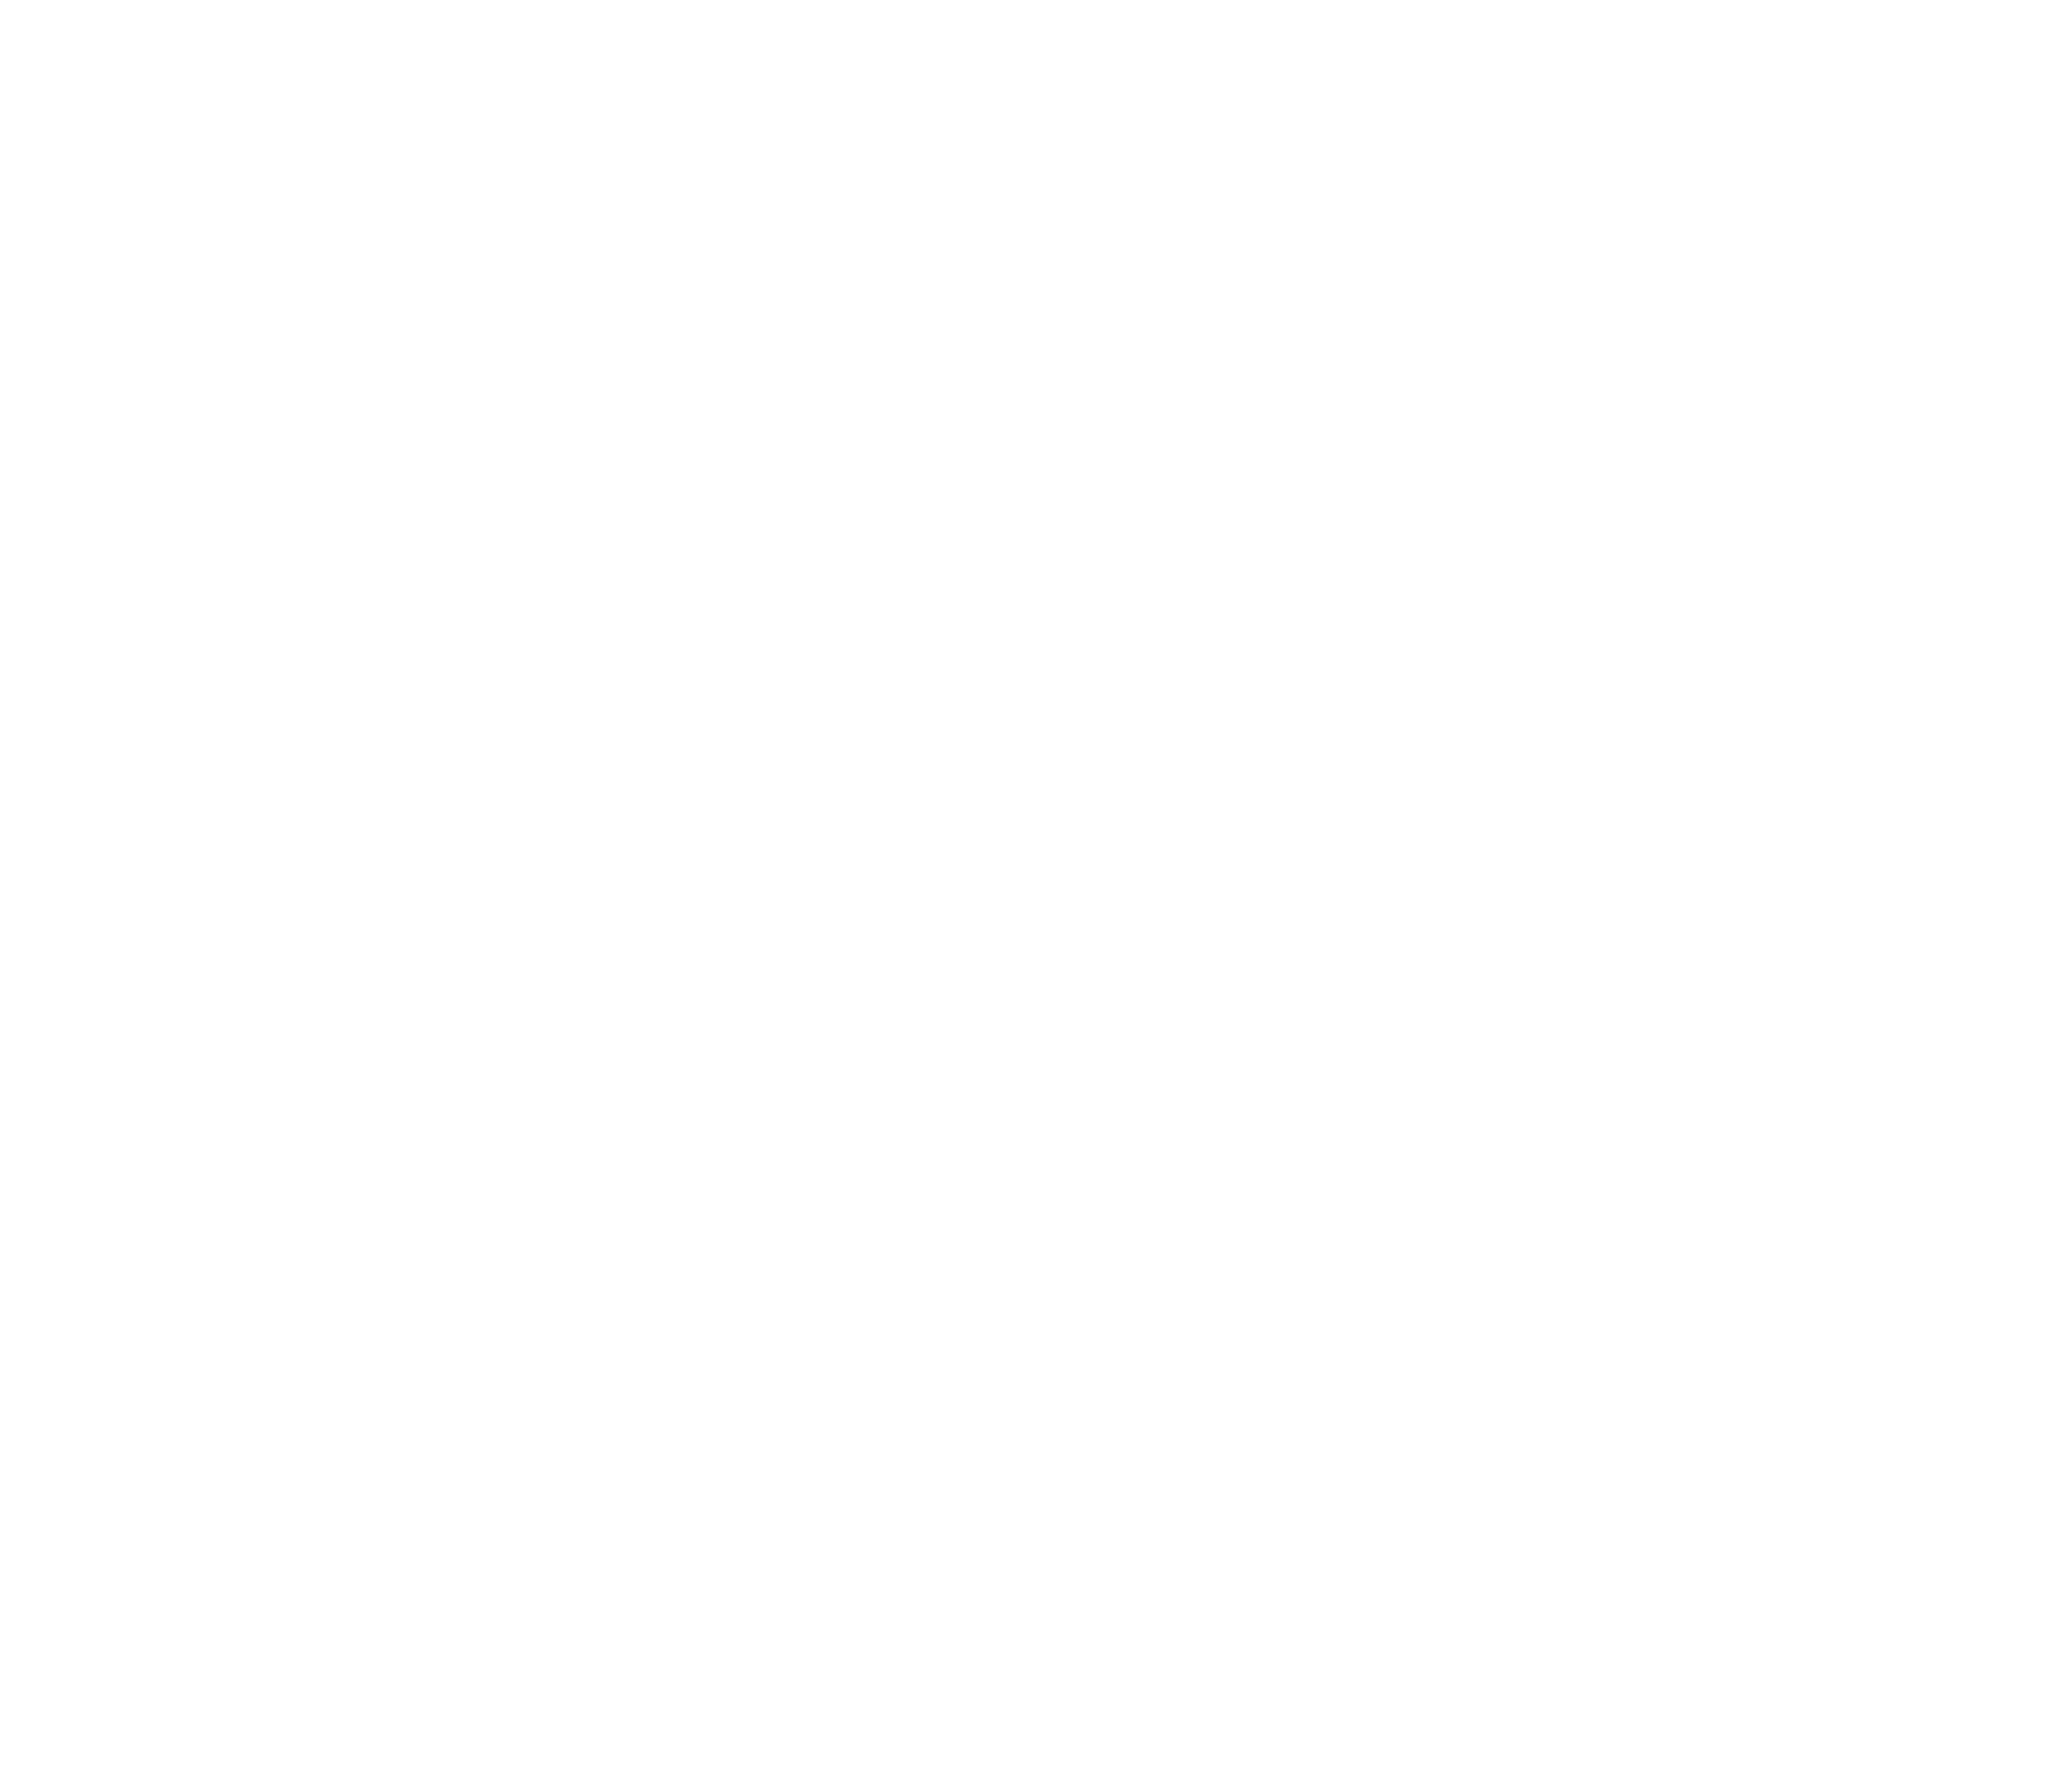 AMBIEDUCA